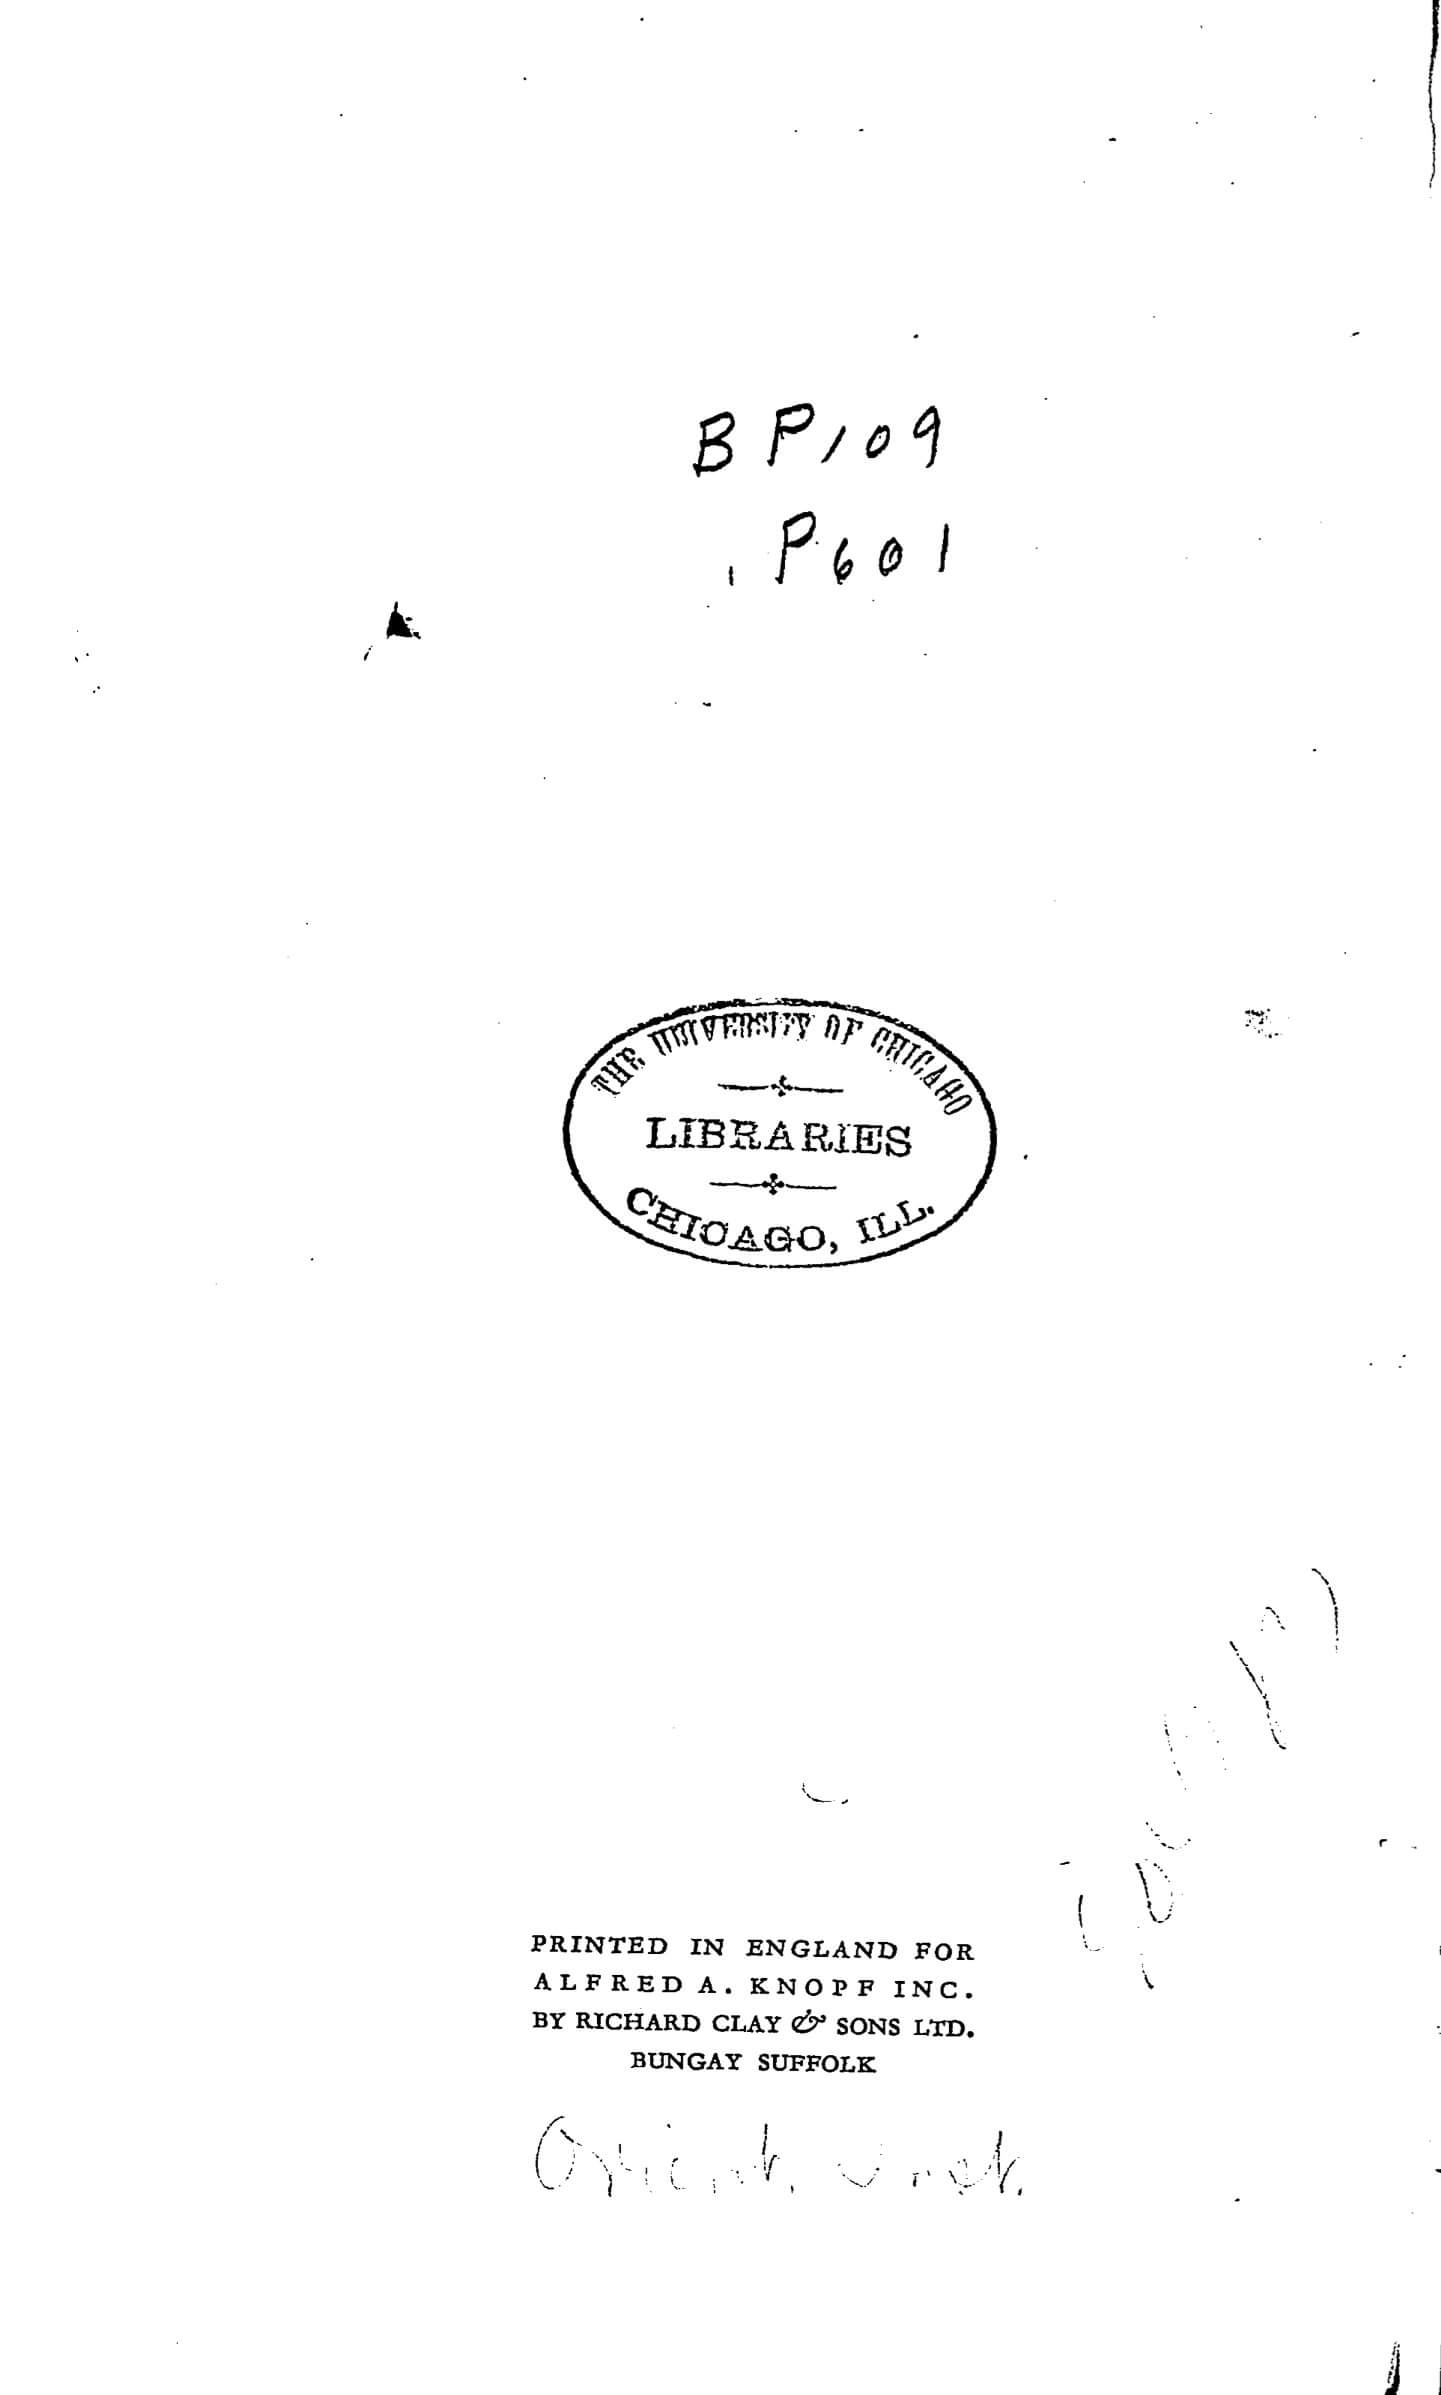 Marmaduke Pickthall 1930 Quran Explorer, Page 2